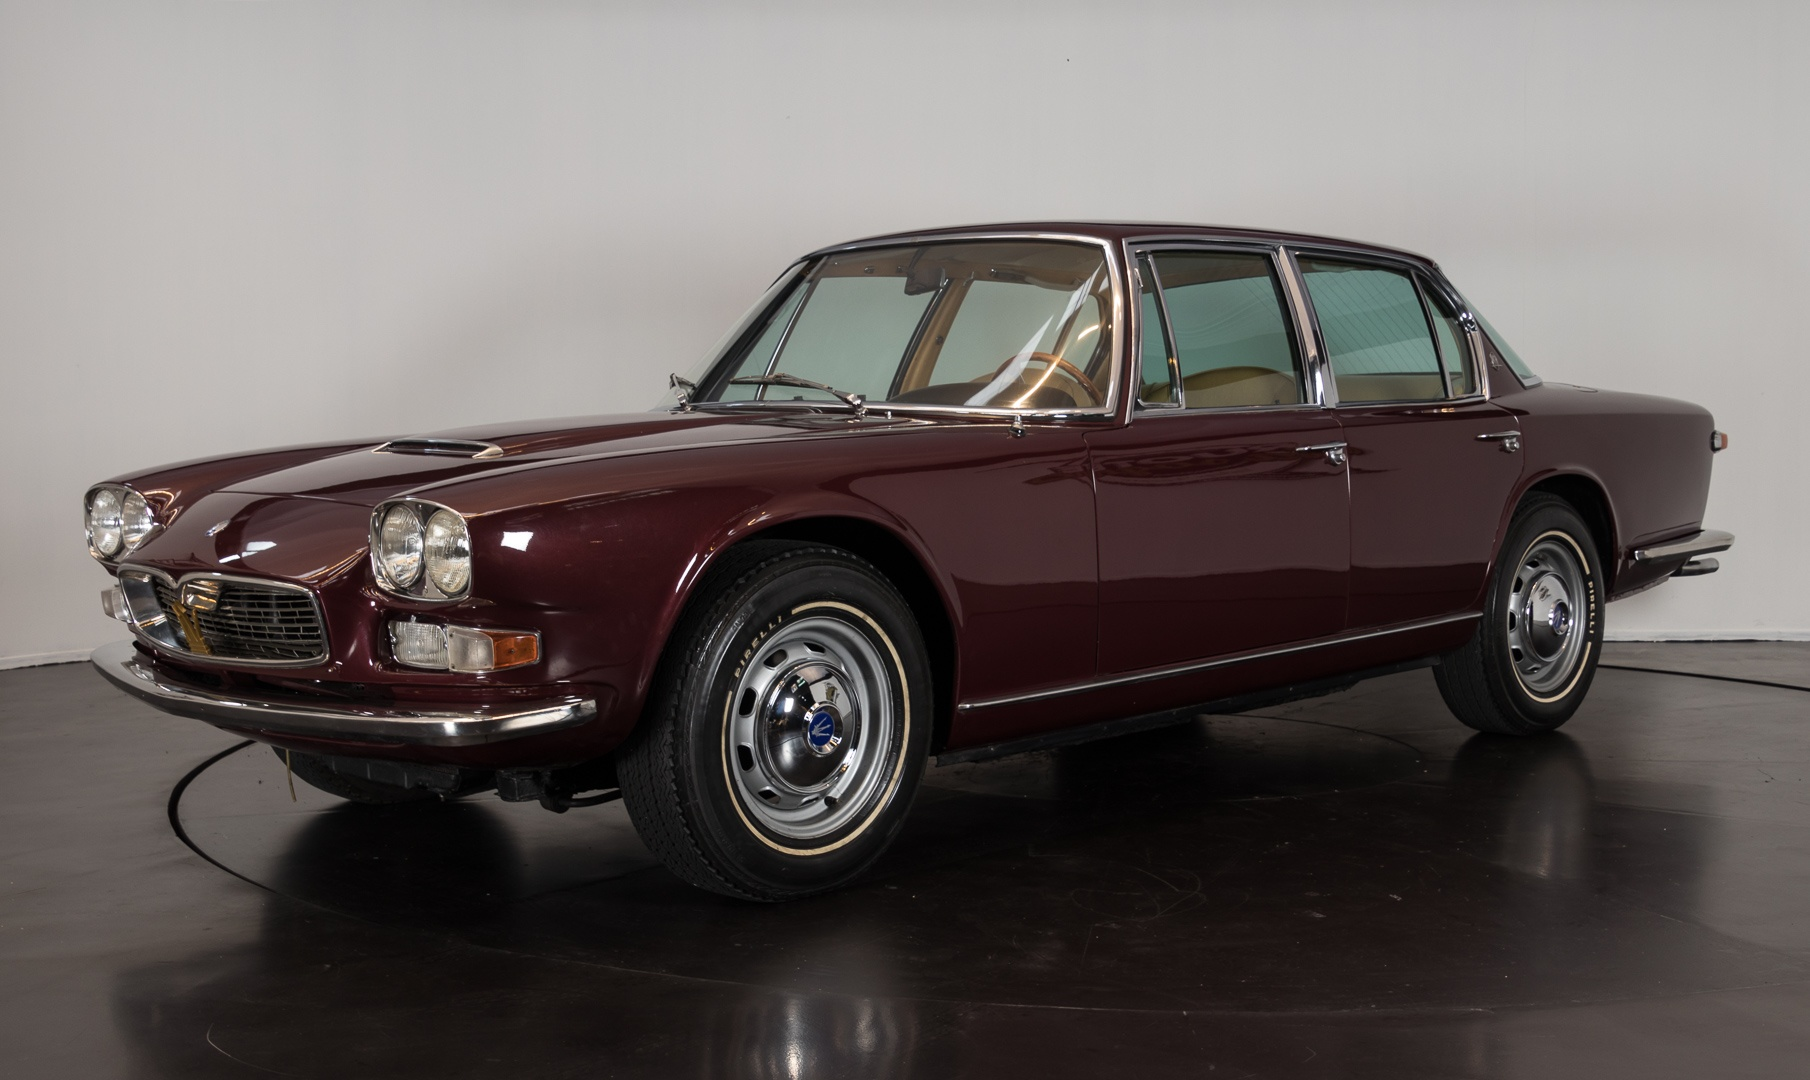 1967 maserati quattroporte i serie classic driver market. Black Bedroom Furniture Sets. Home Design Ideas